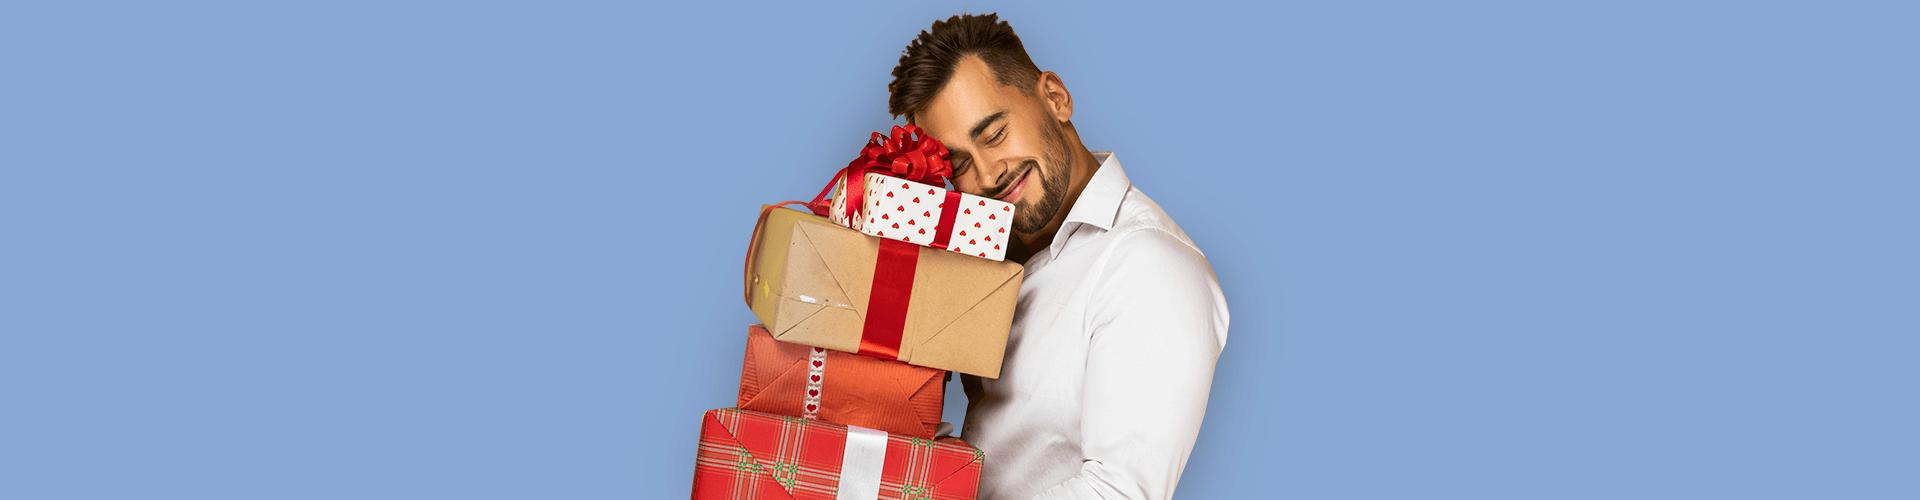 подарки, мужчина, счастливый